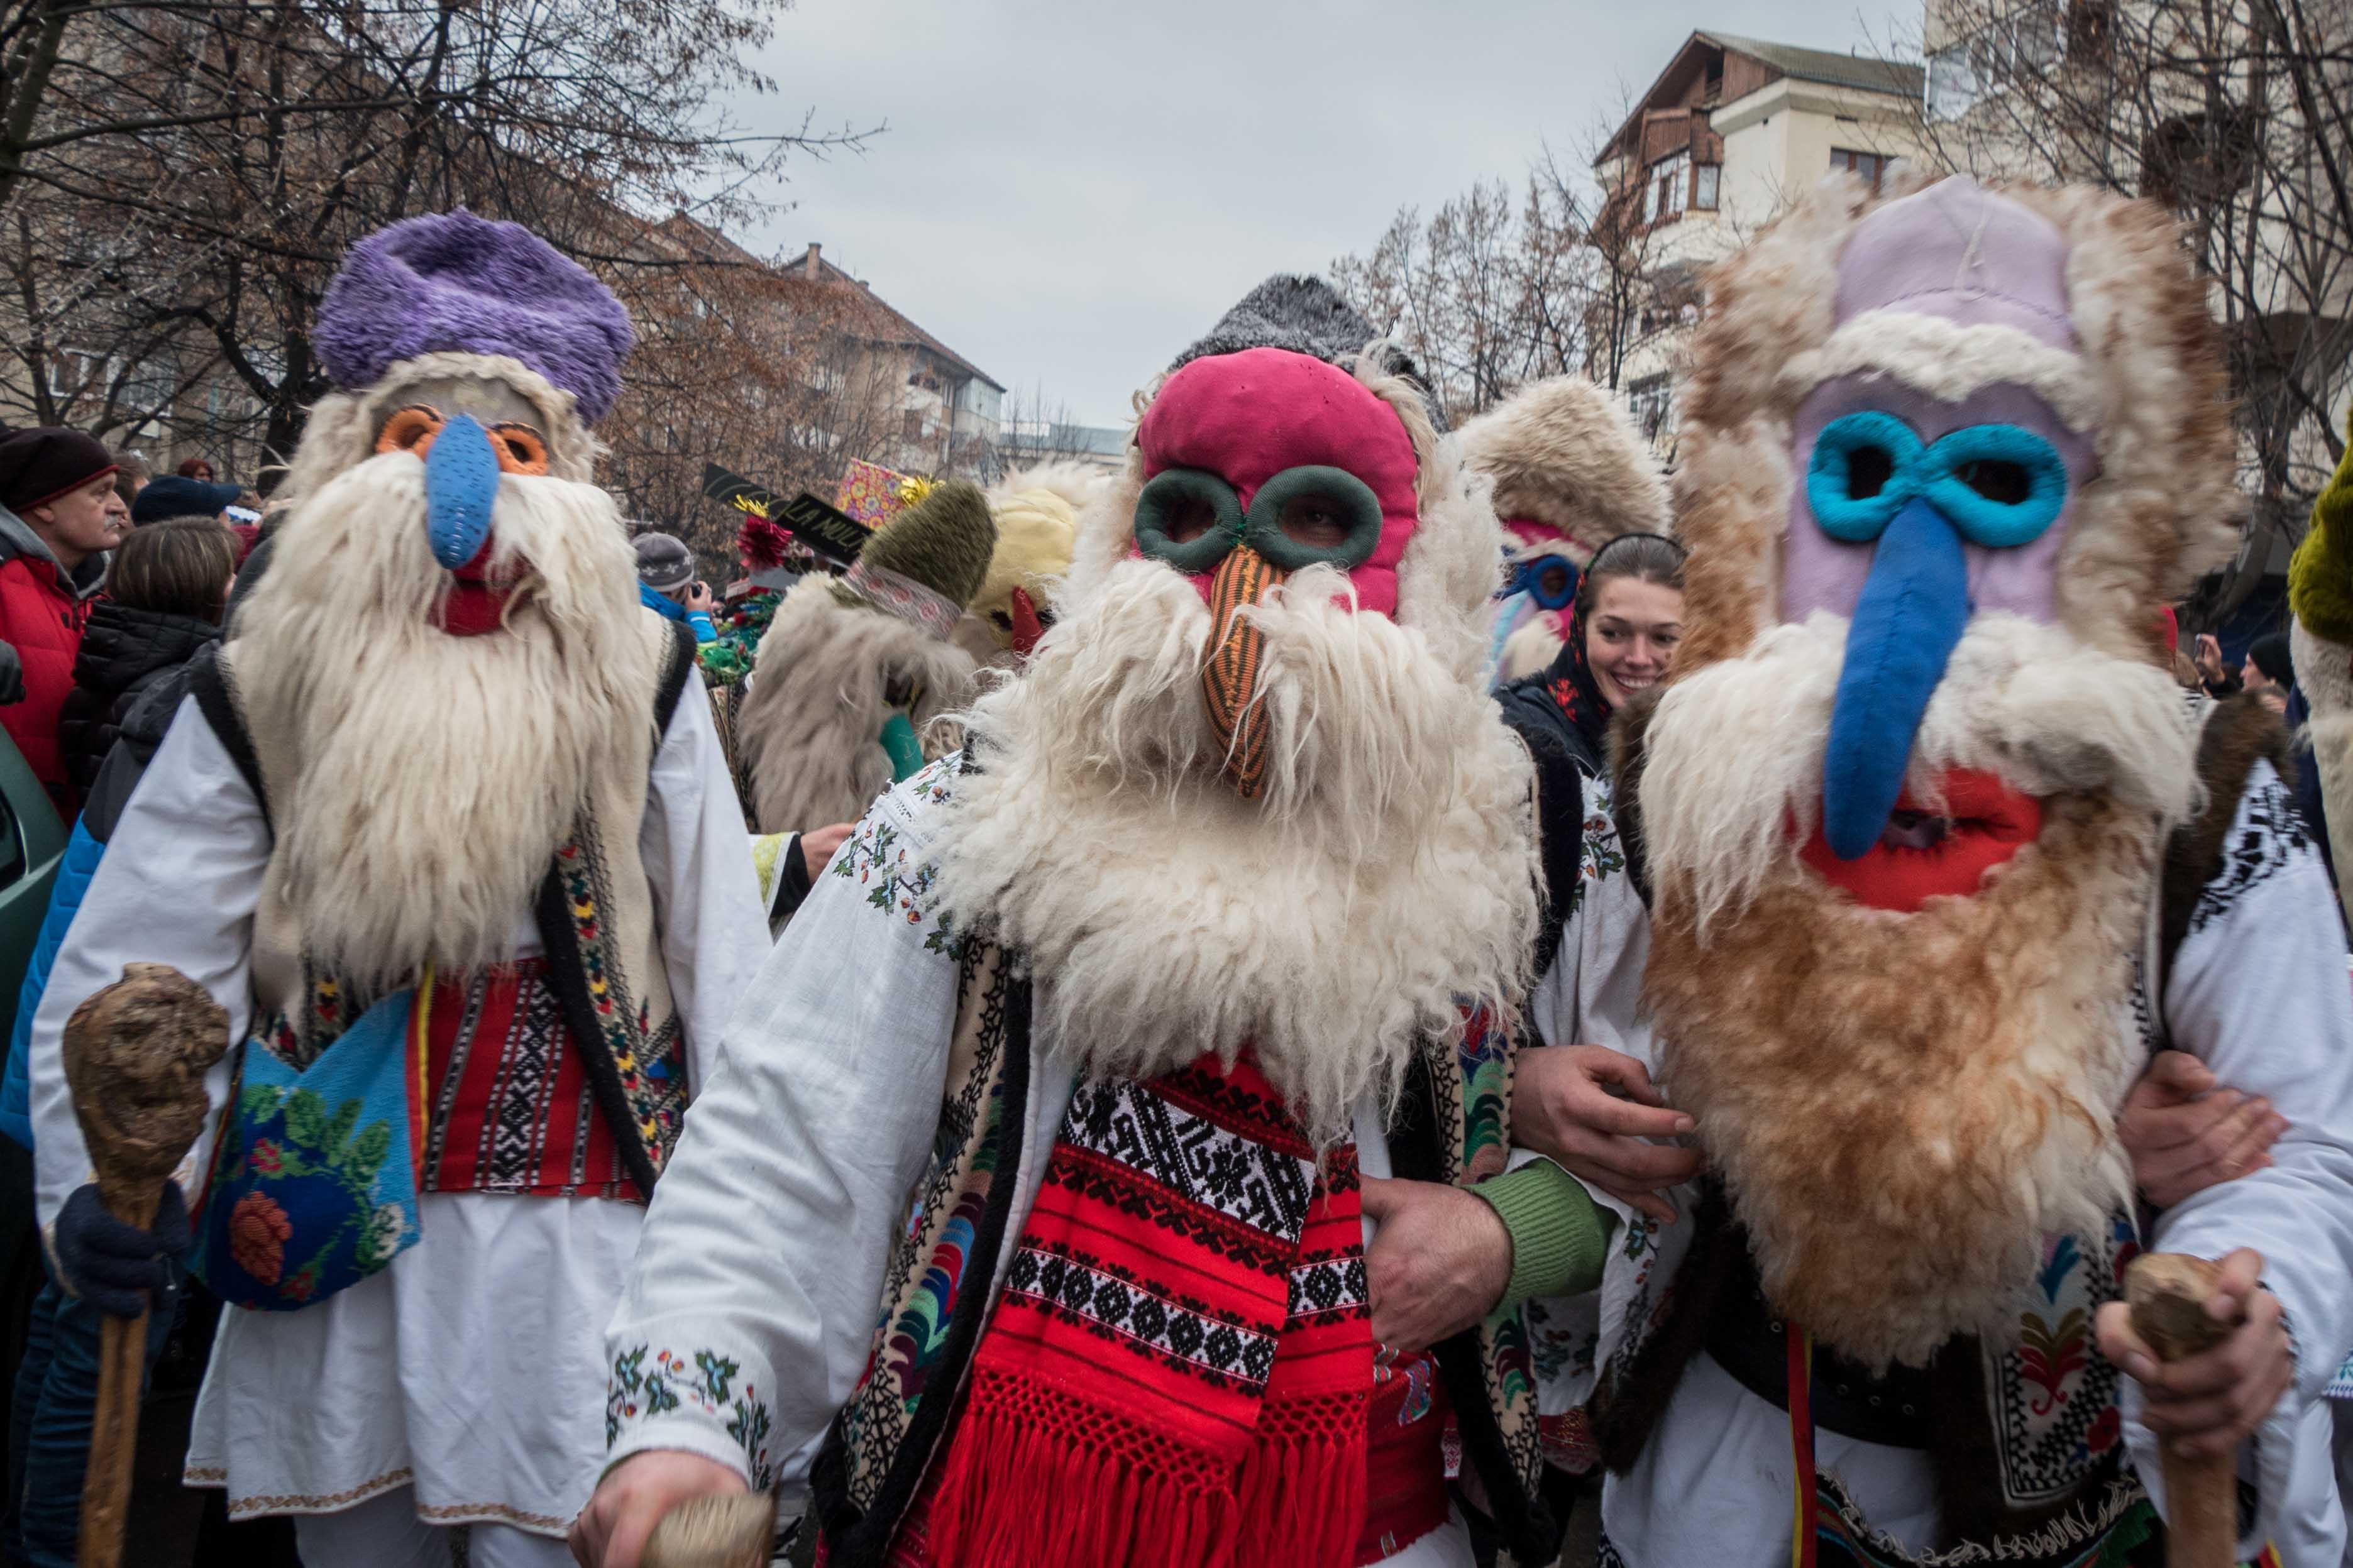 Winter festival in Sighet - Christmas Photo Tour in Maramures, Romania